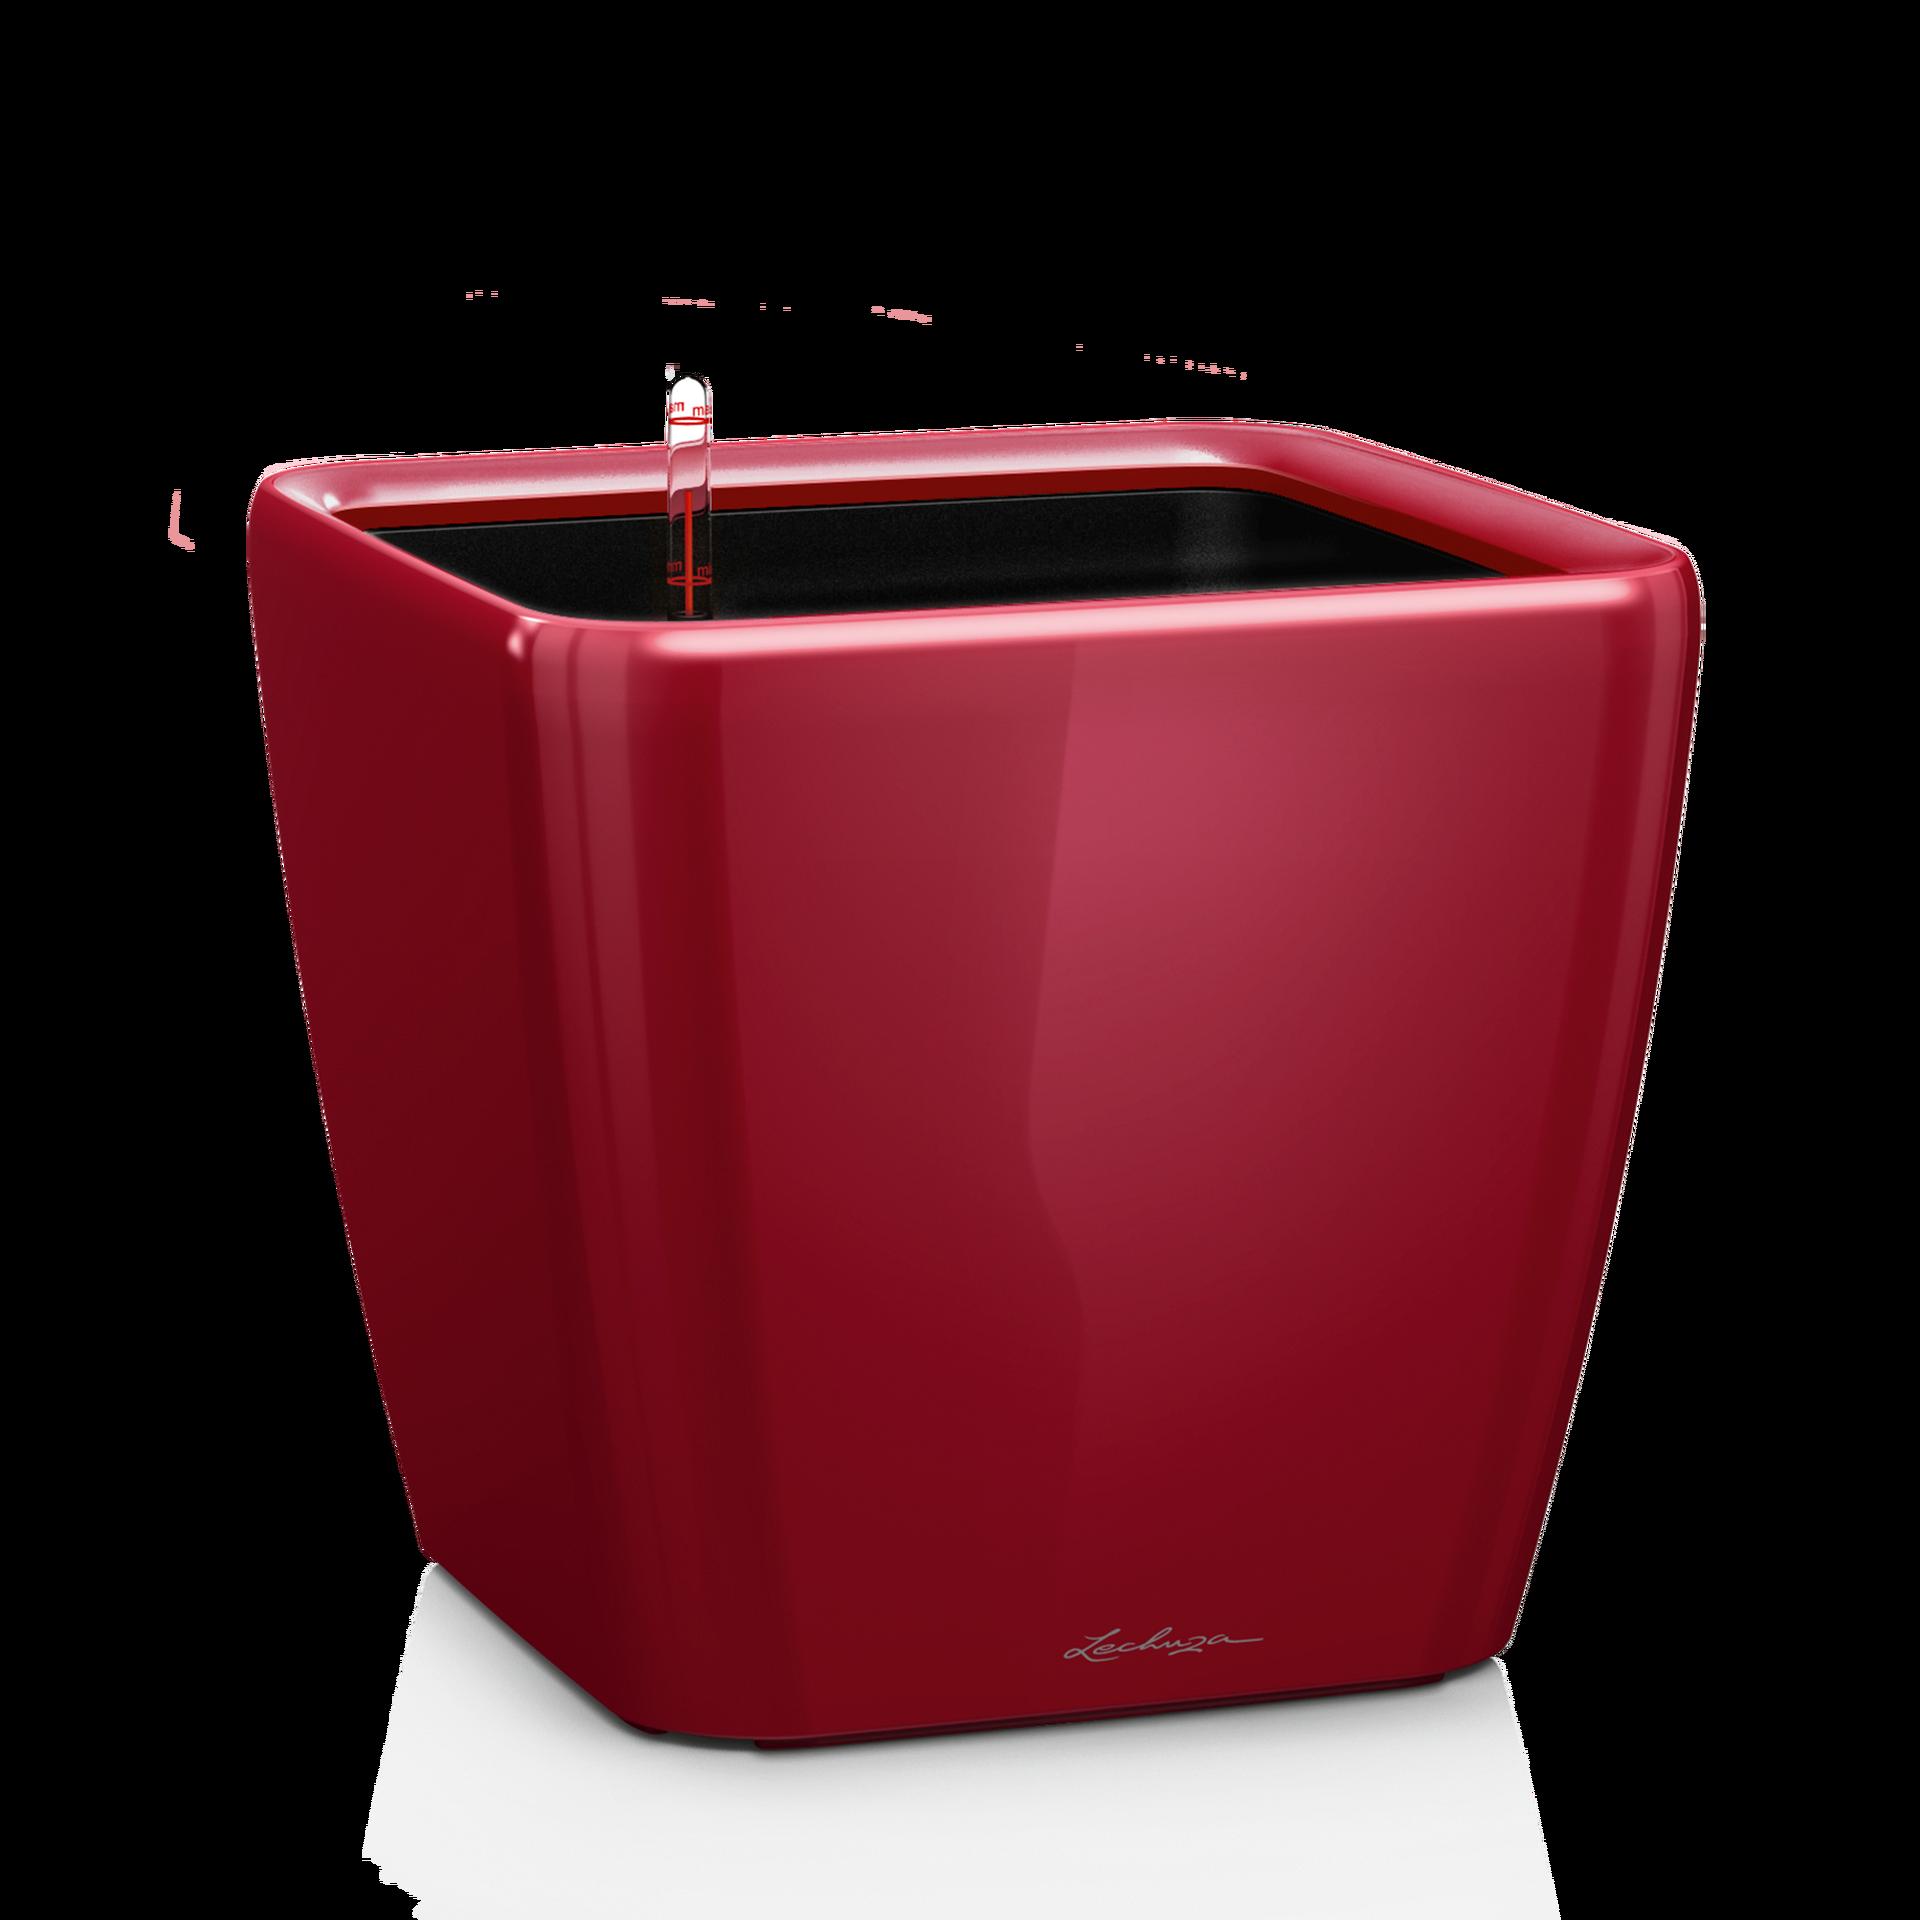 QUADRO LS 50 scarlet red high-gloss